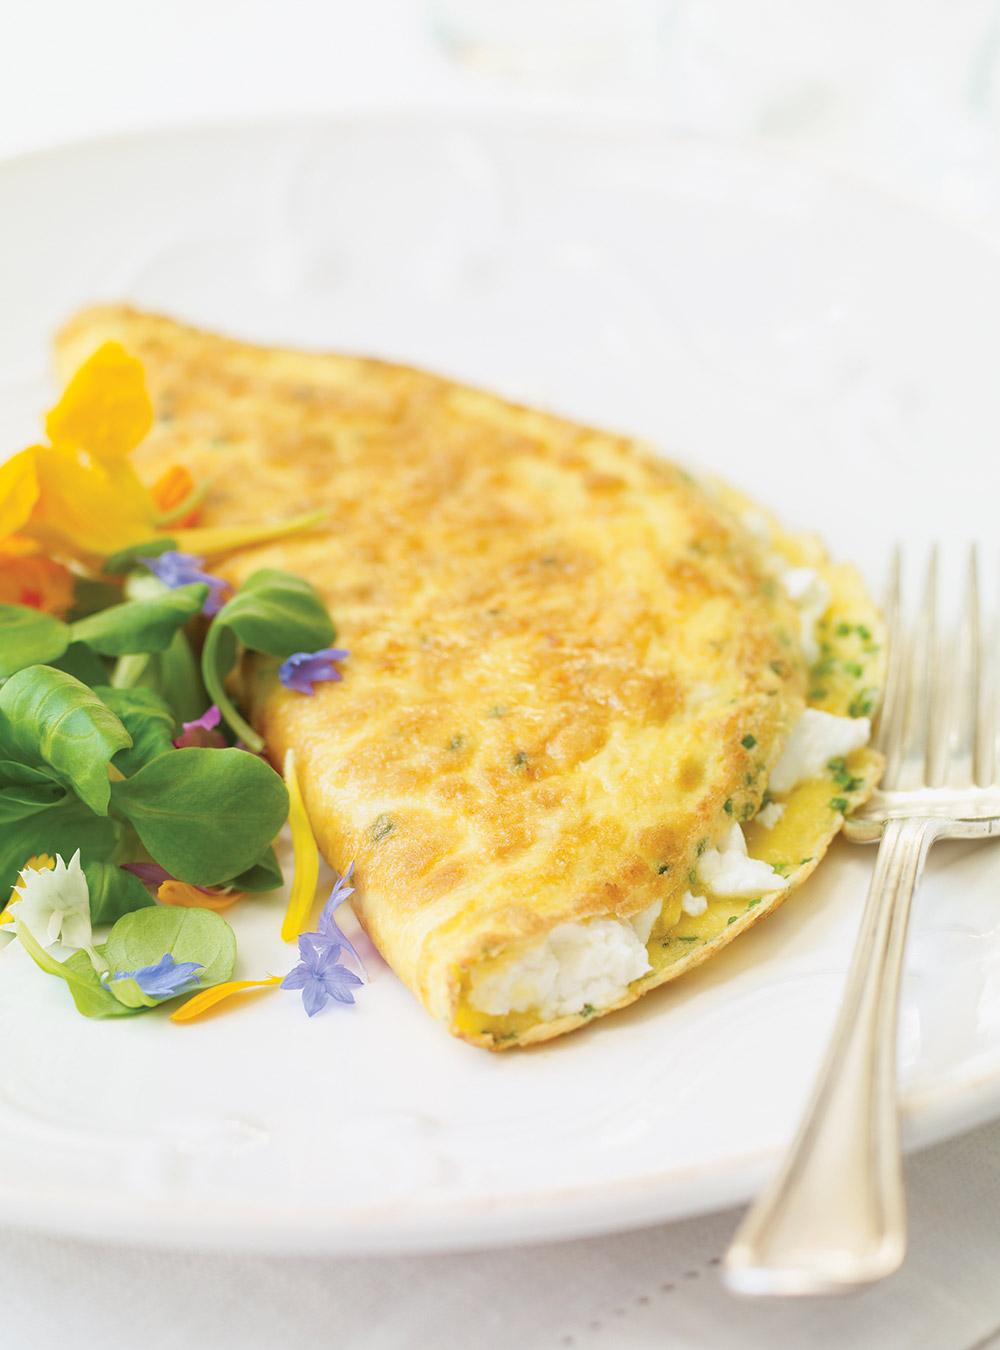 Omelette au chèvre frais | ricardo